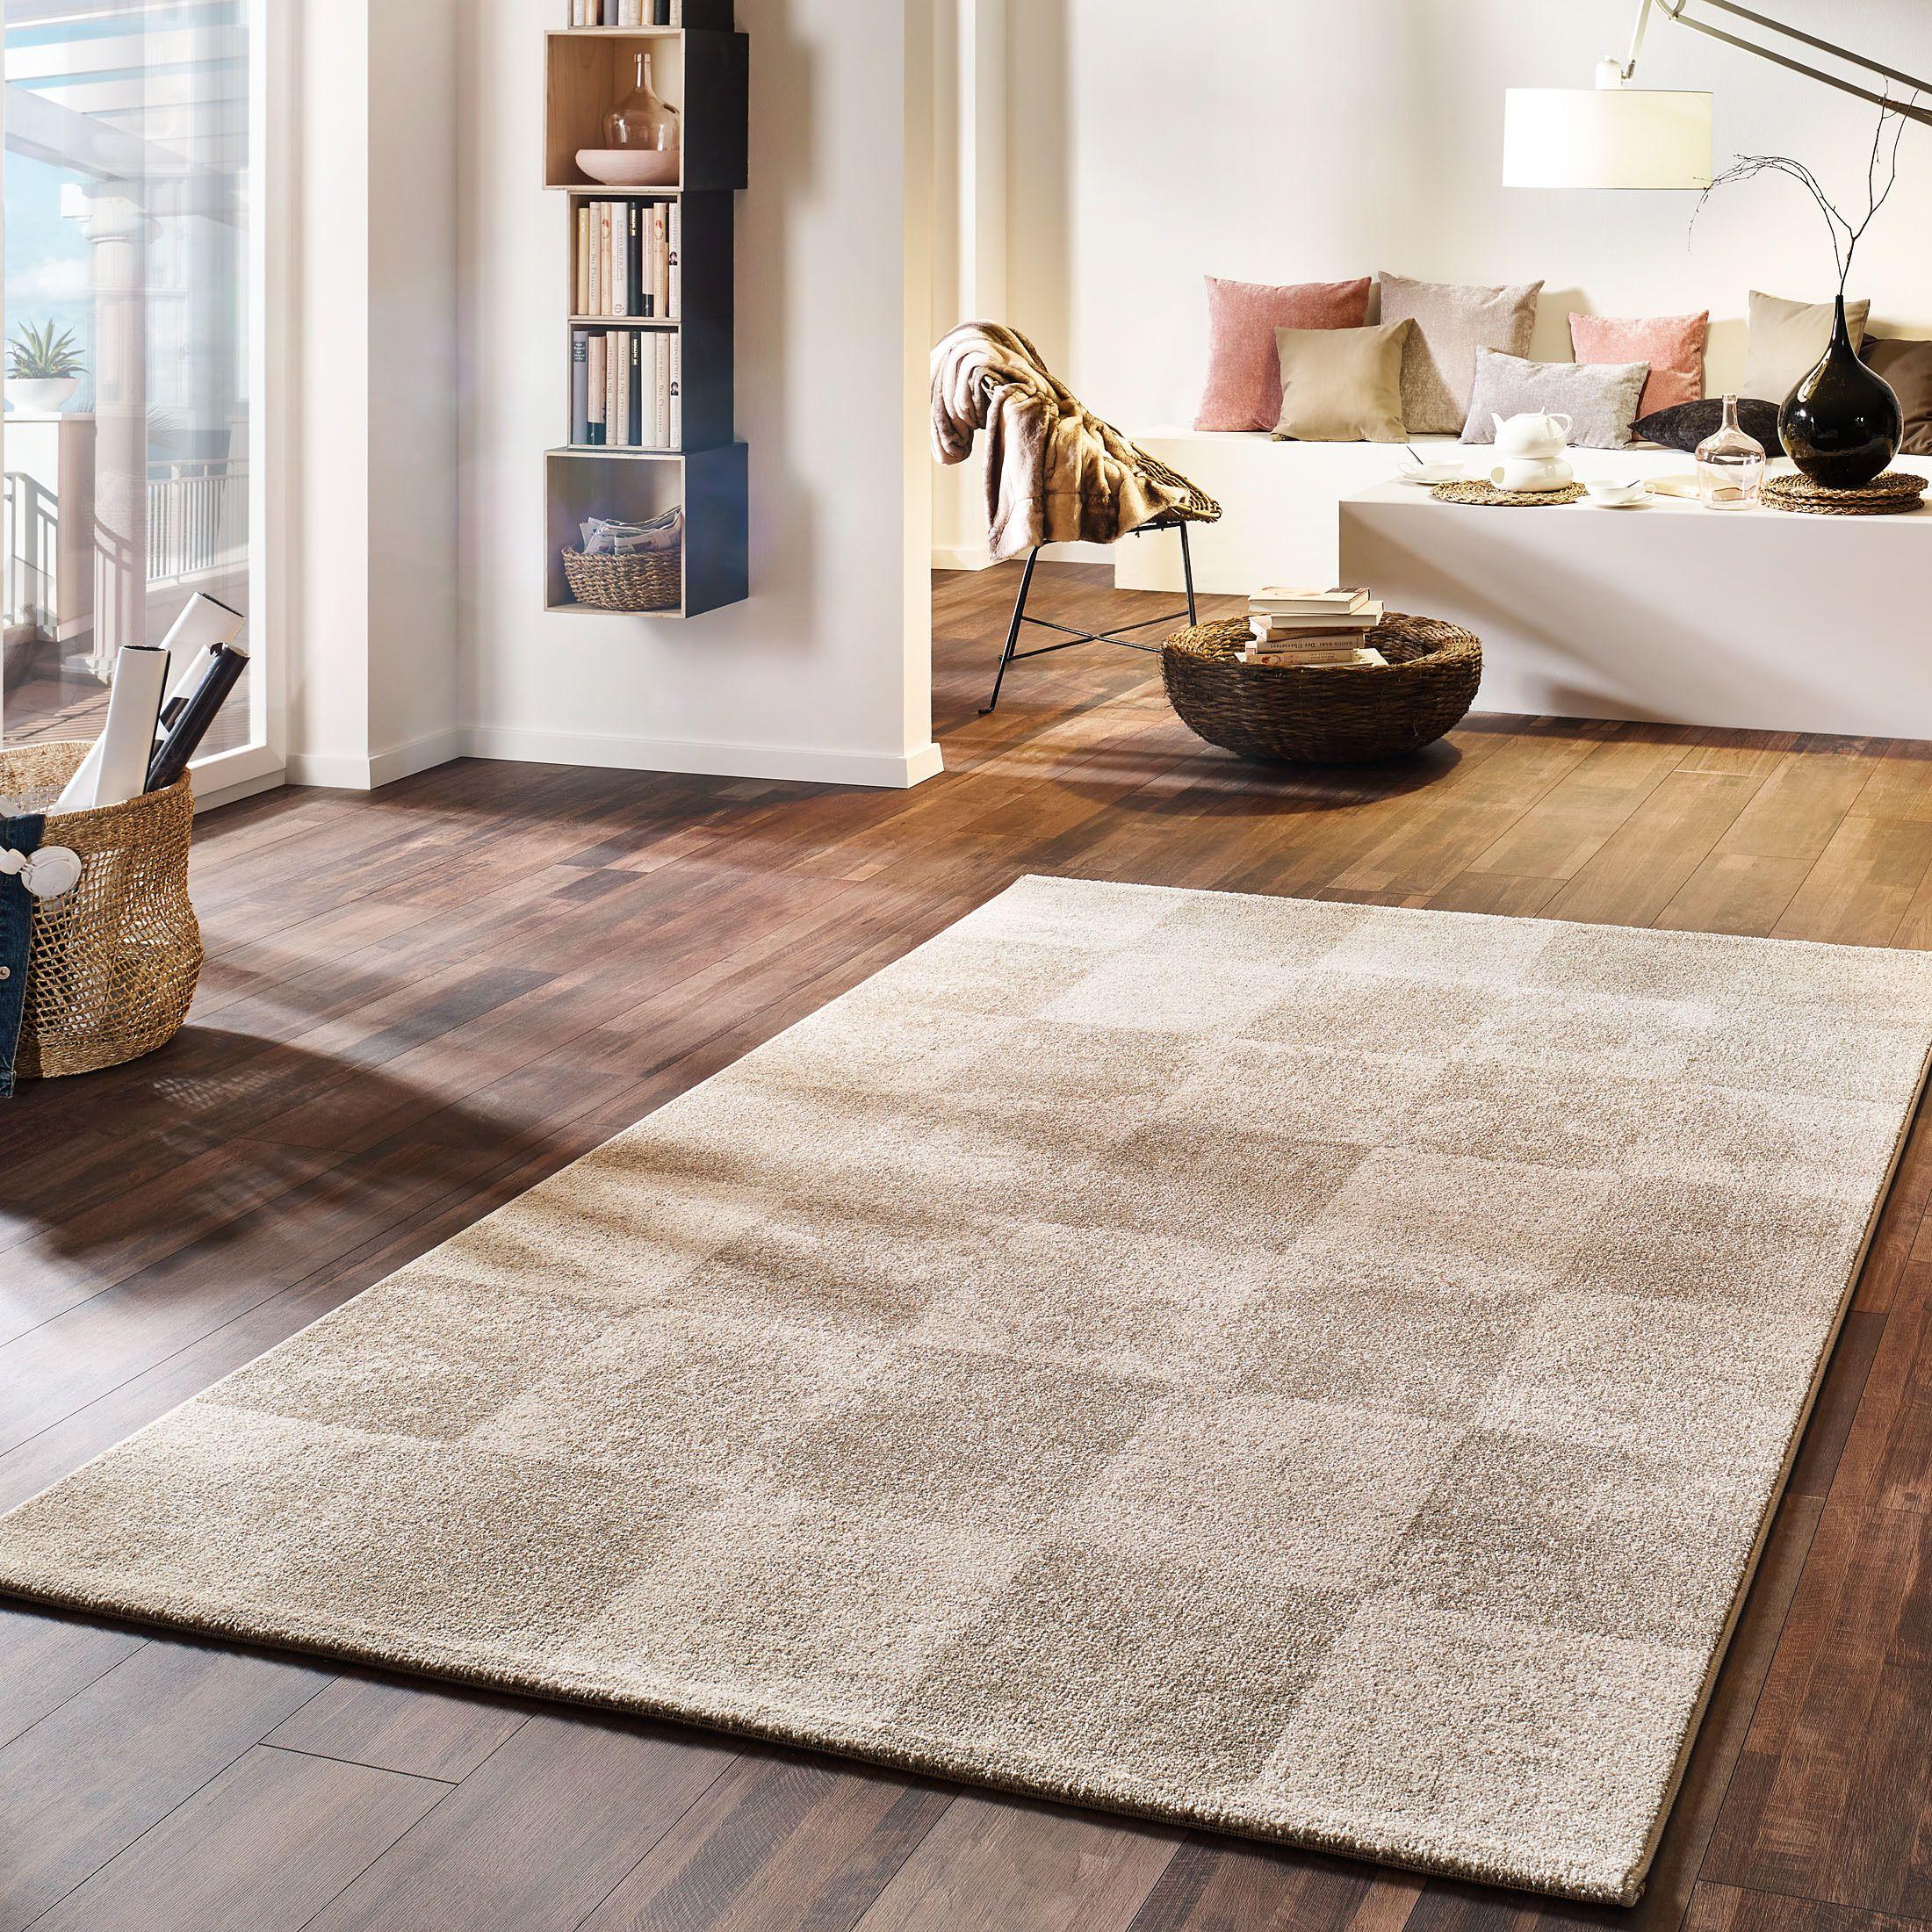 Cube Teppichboden Moderne Teppiche Teppich Design